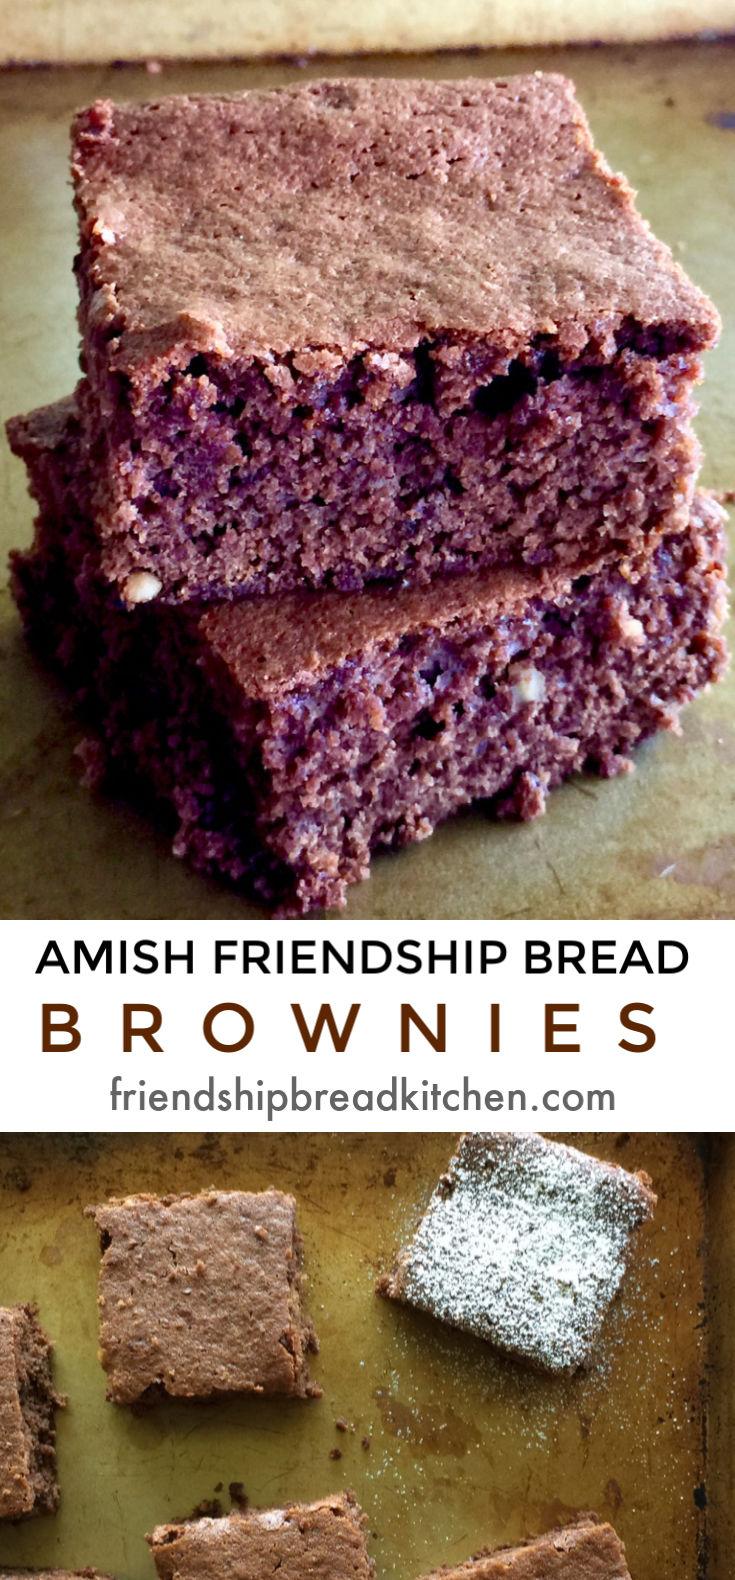 Amish Friendship Bread Brownies